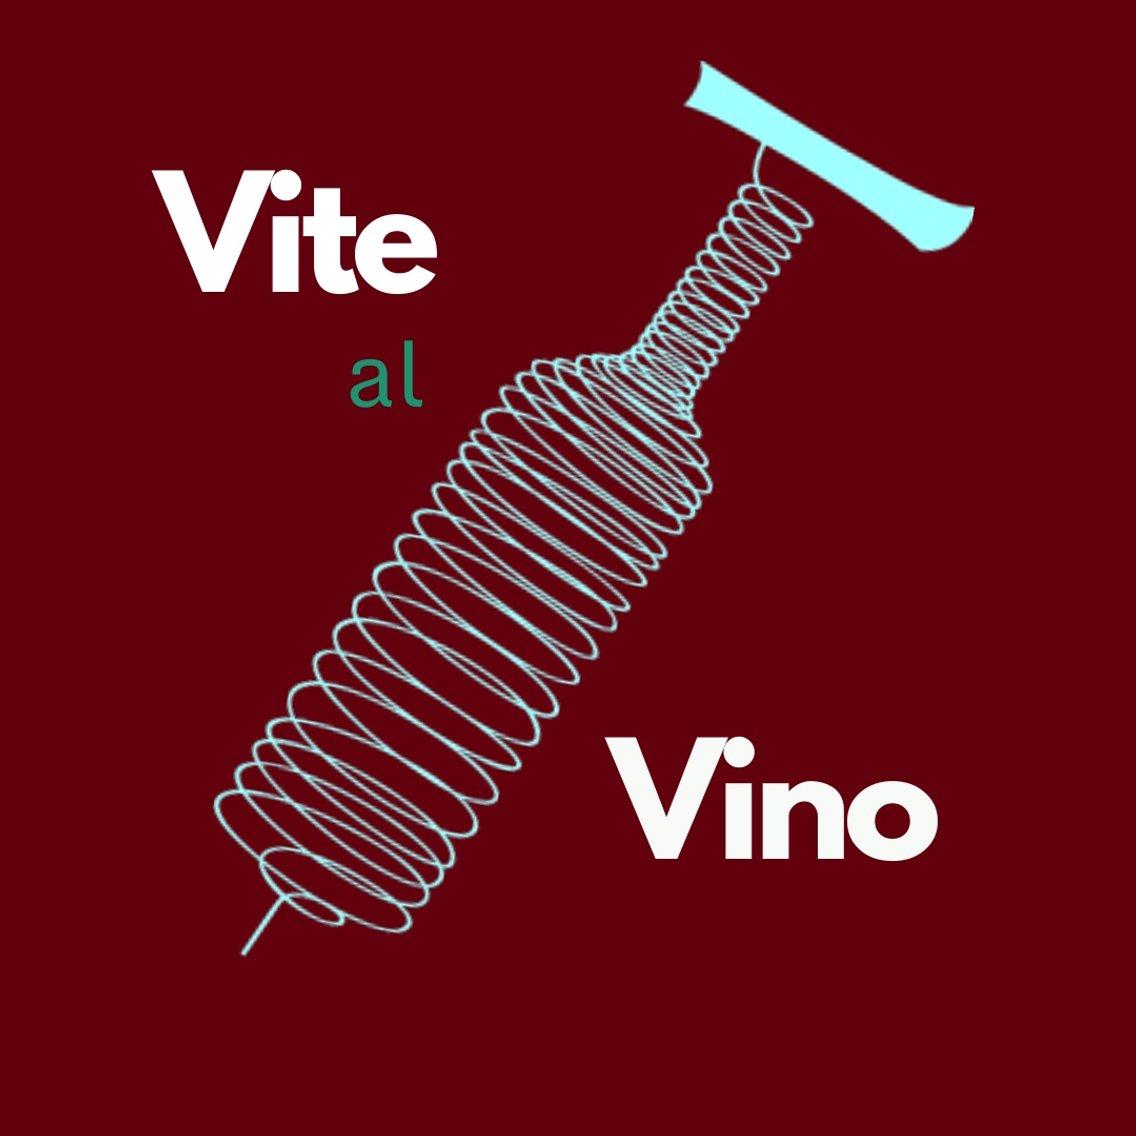 Vite al Vino - Cover Image